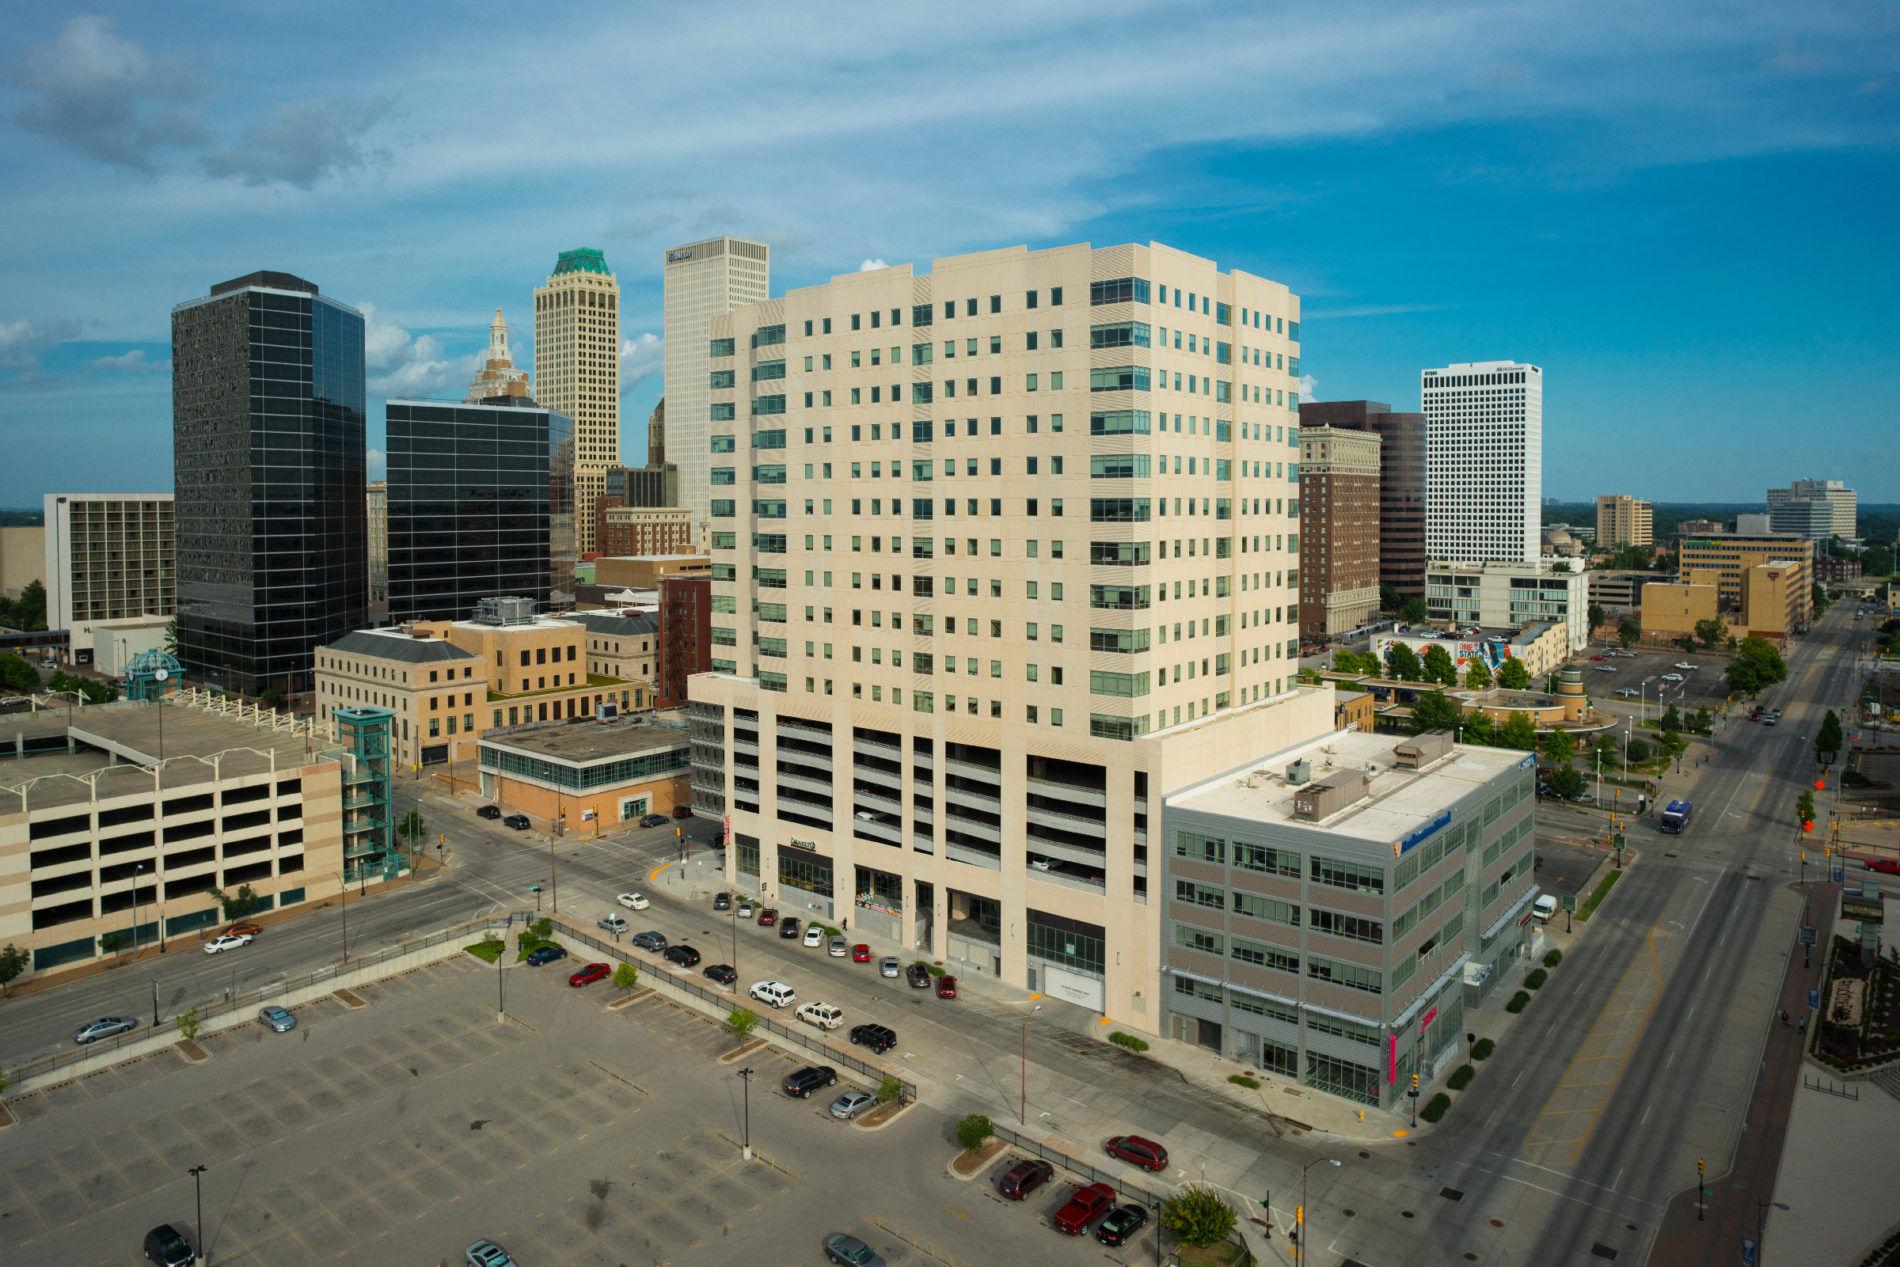 Downtown Tulsa image showing Cimarex building